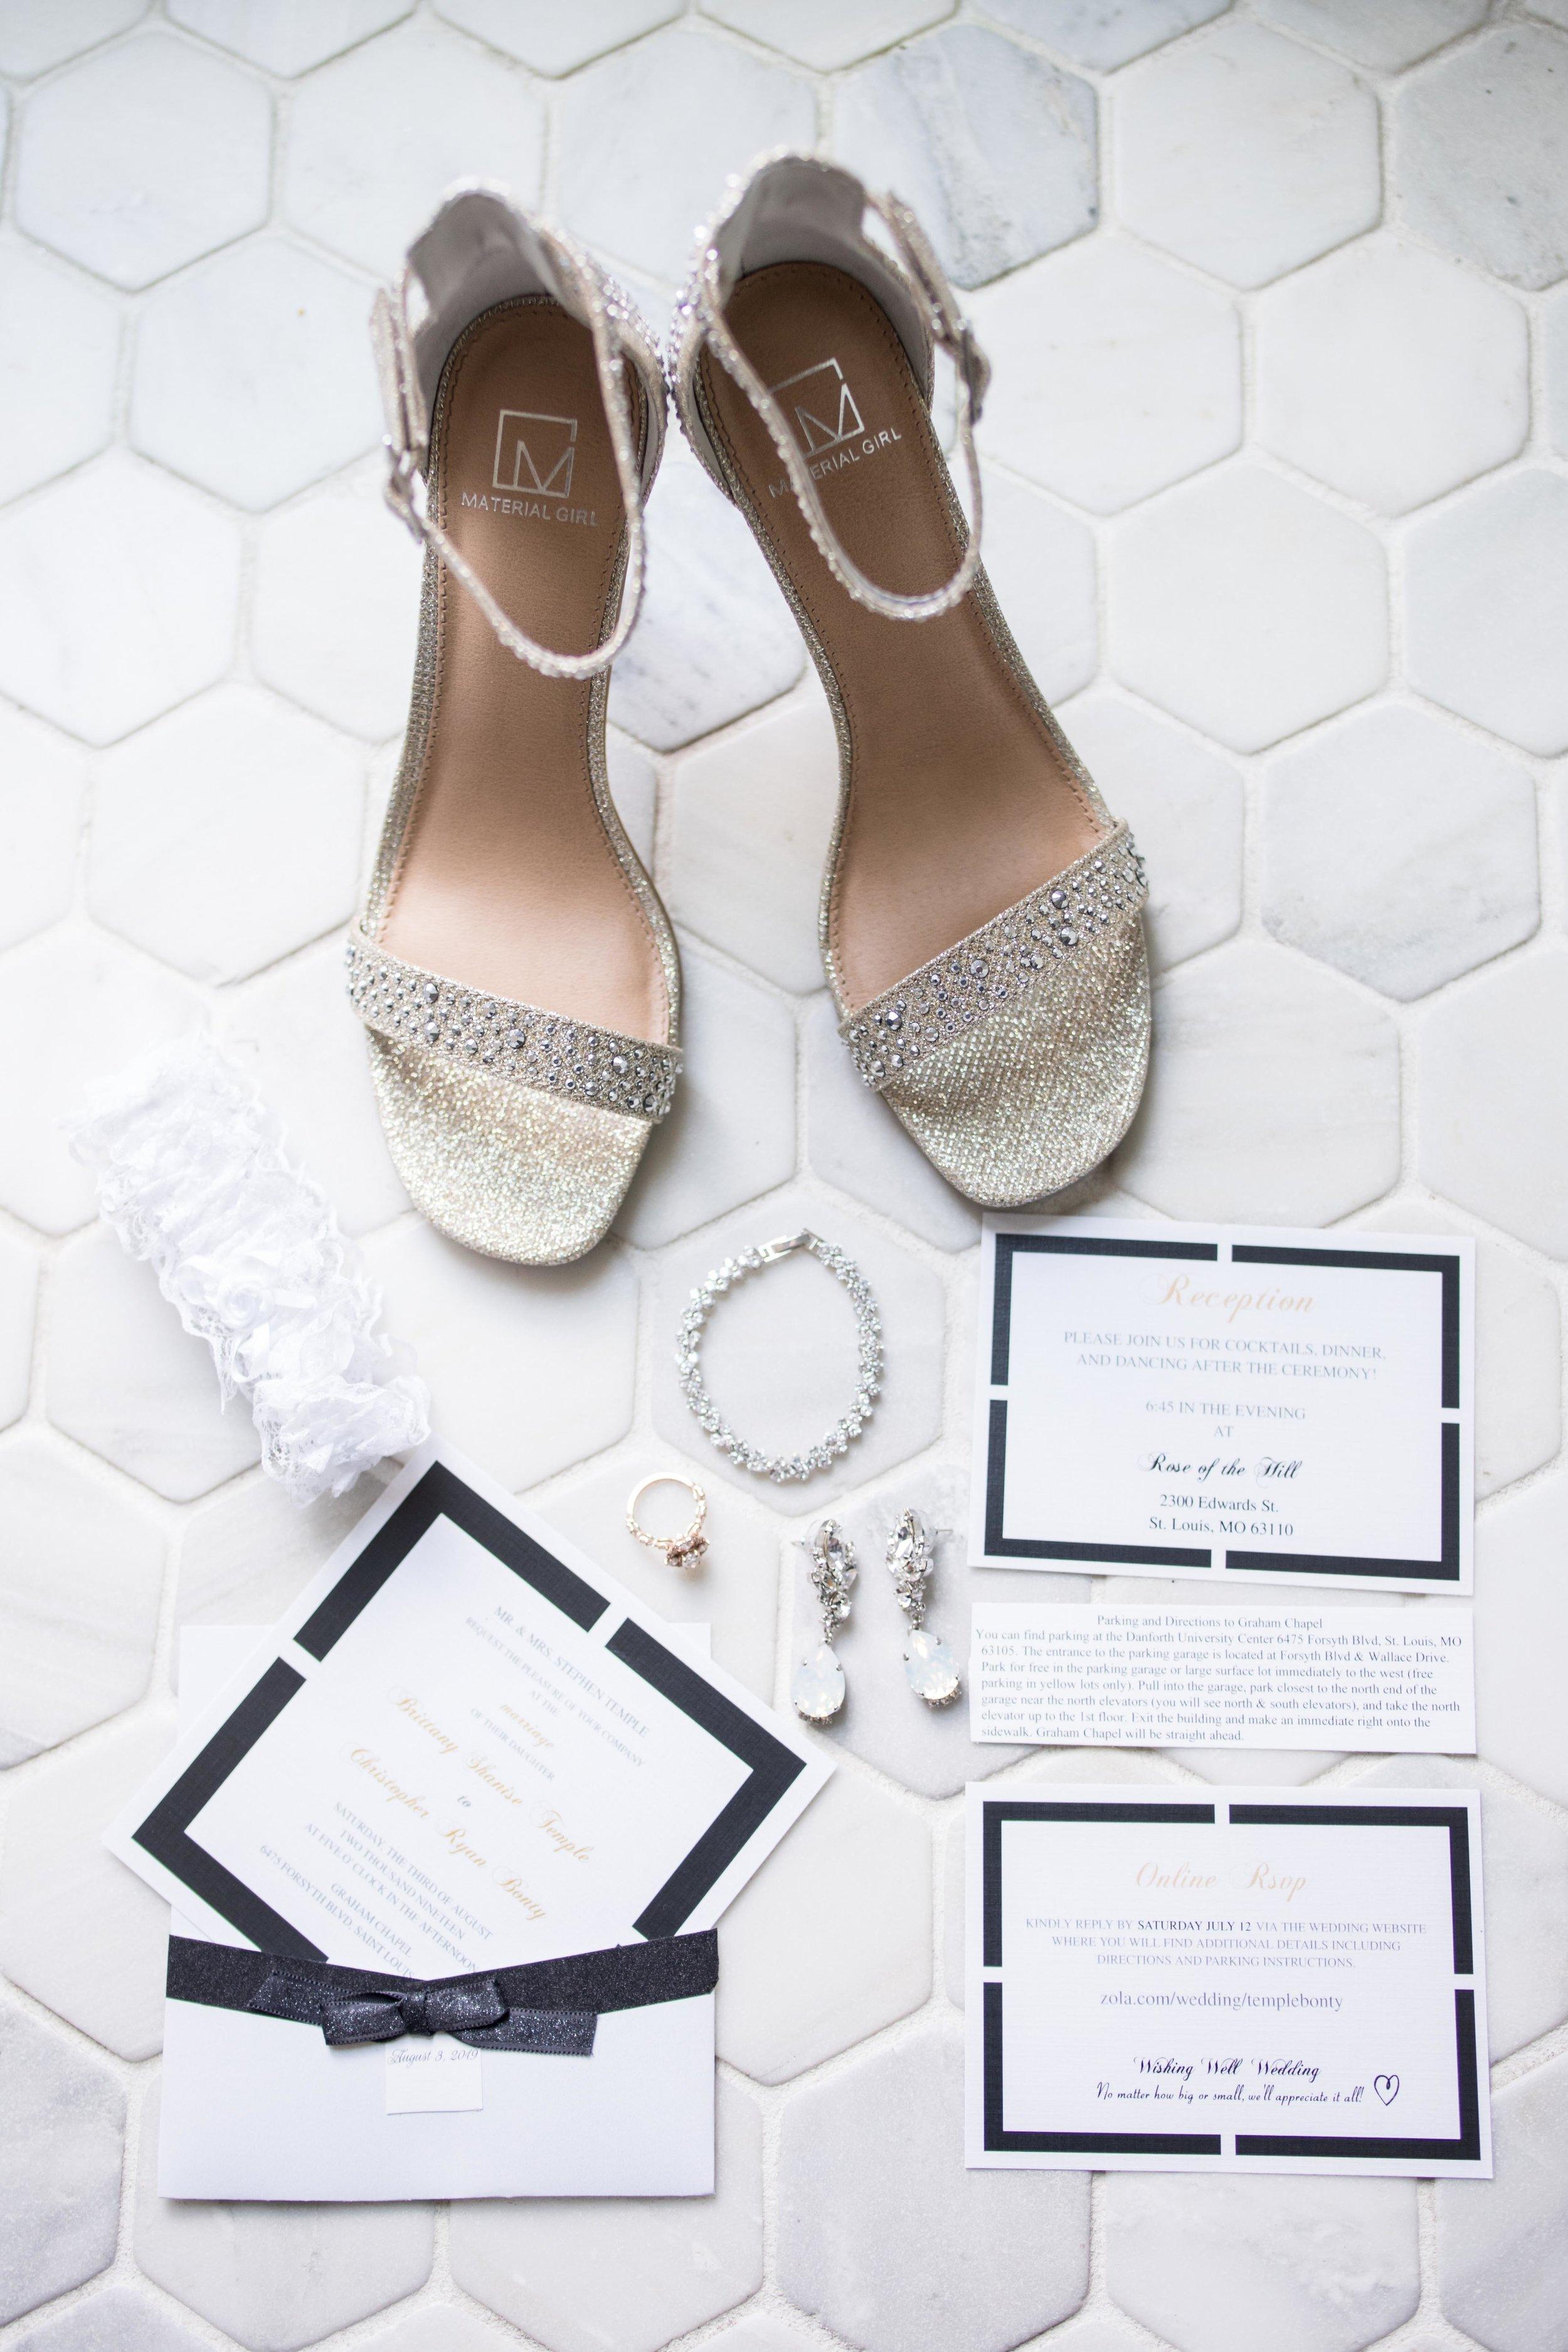 8_3_2019_BONTY_WEDDING-41.jpg